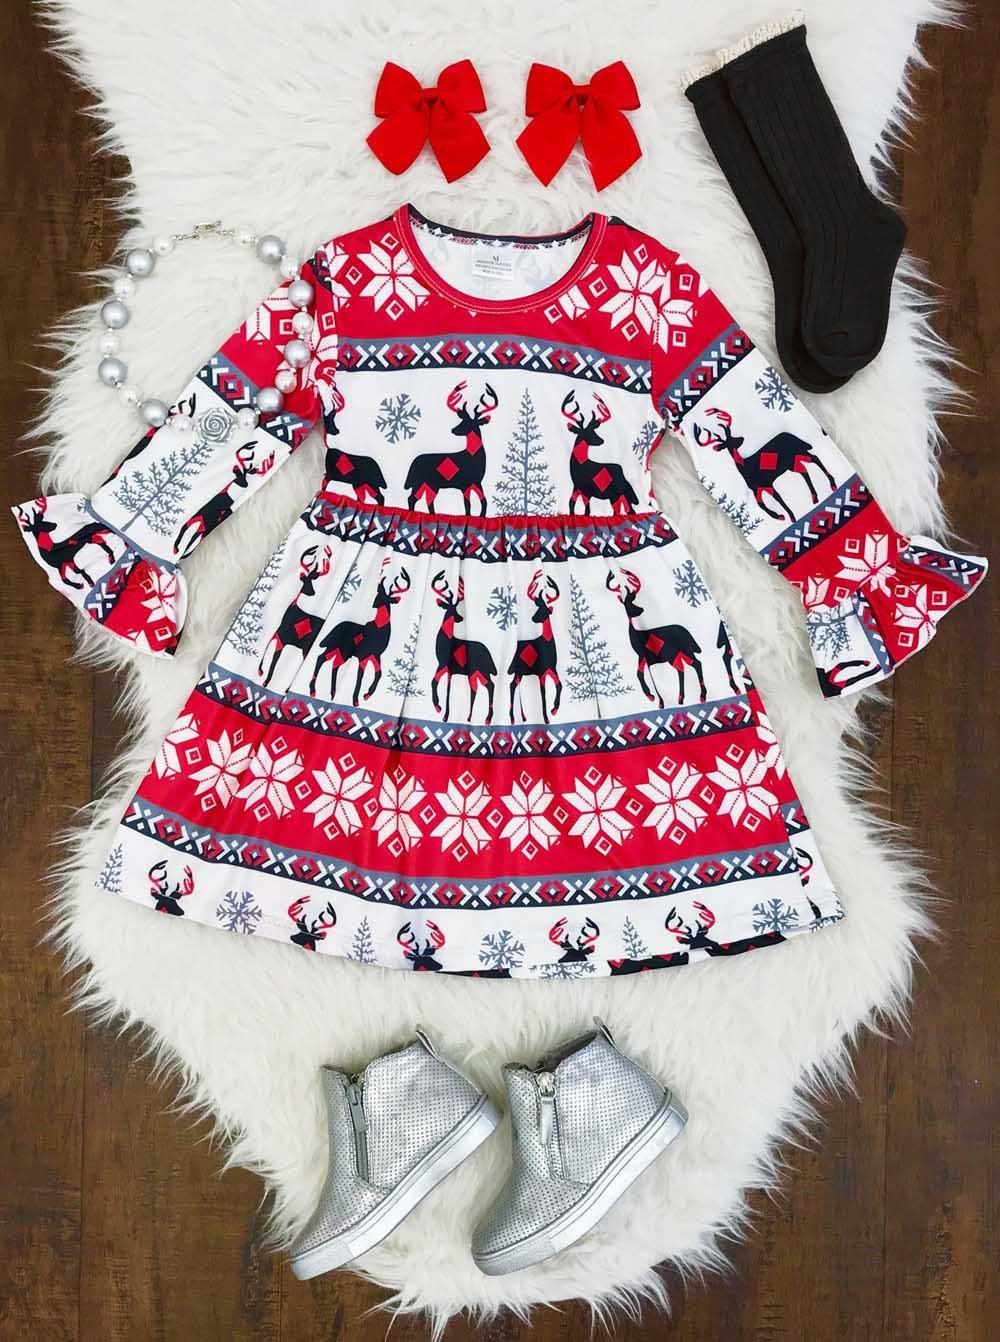 Toddler Infant Baby Kid Girls Christmas XMAS Cartoon Deers Print Dresses Outfits